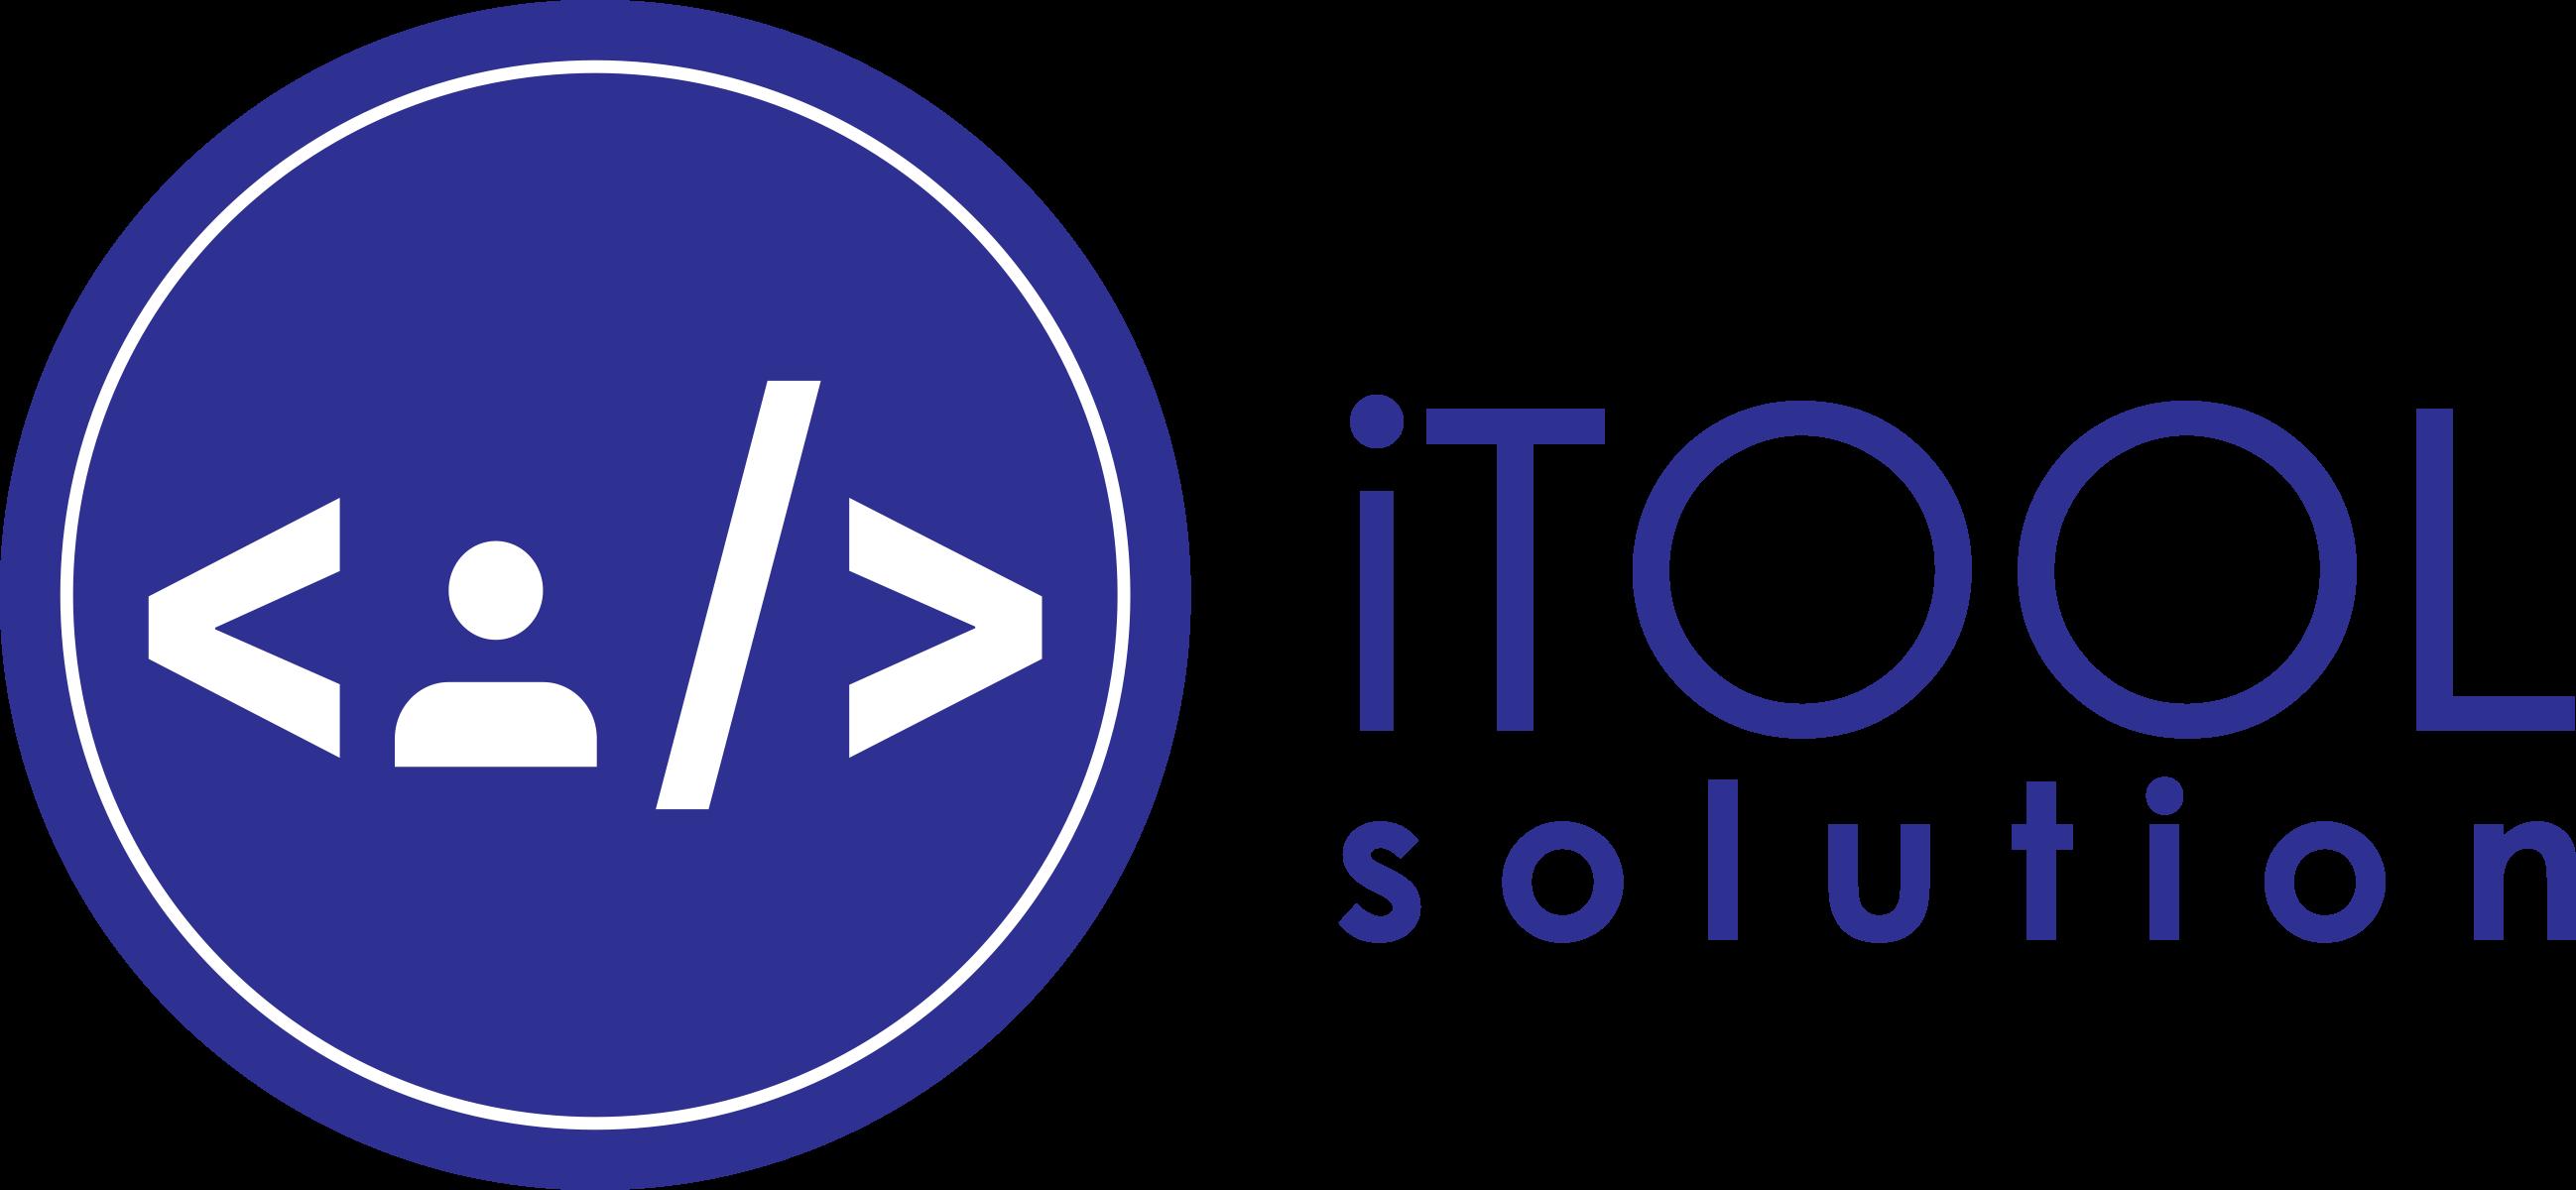 itool solution